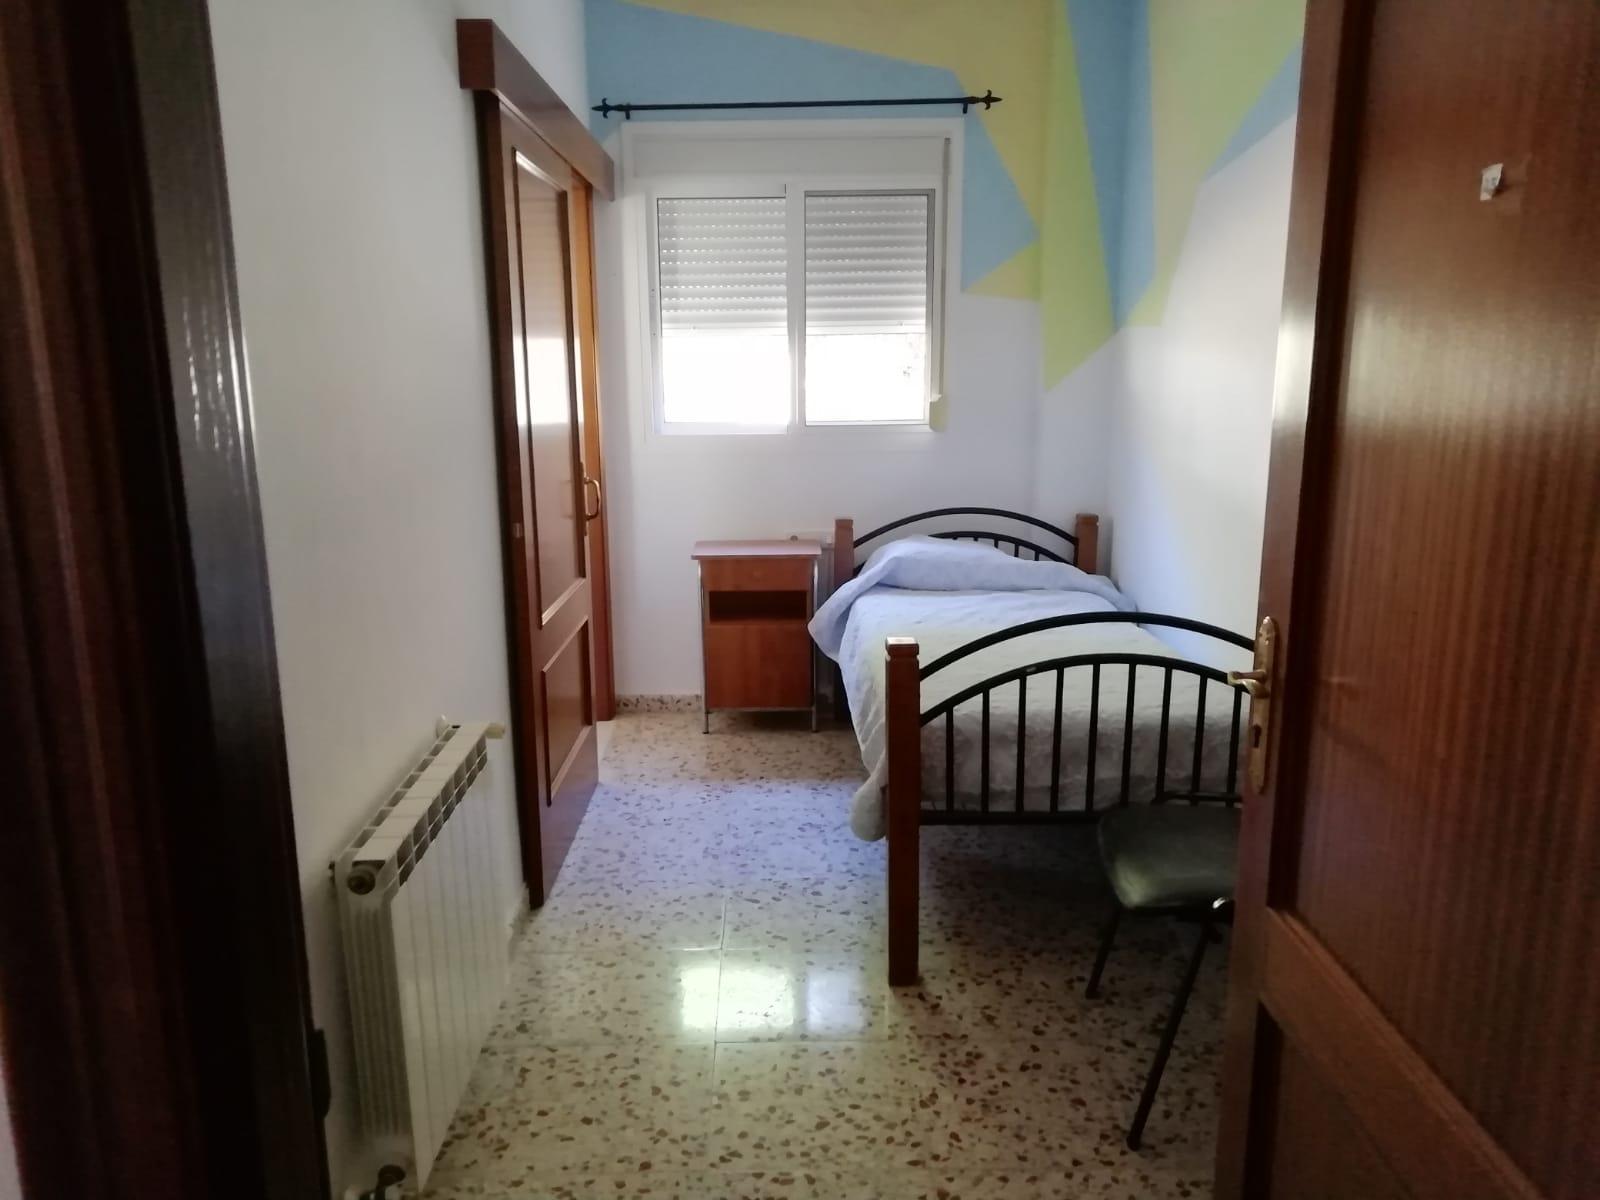 residencia para mayores malaga